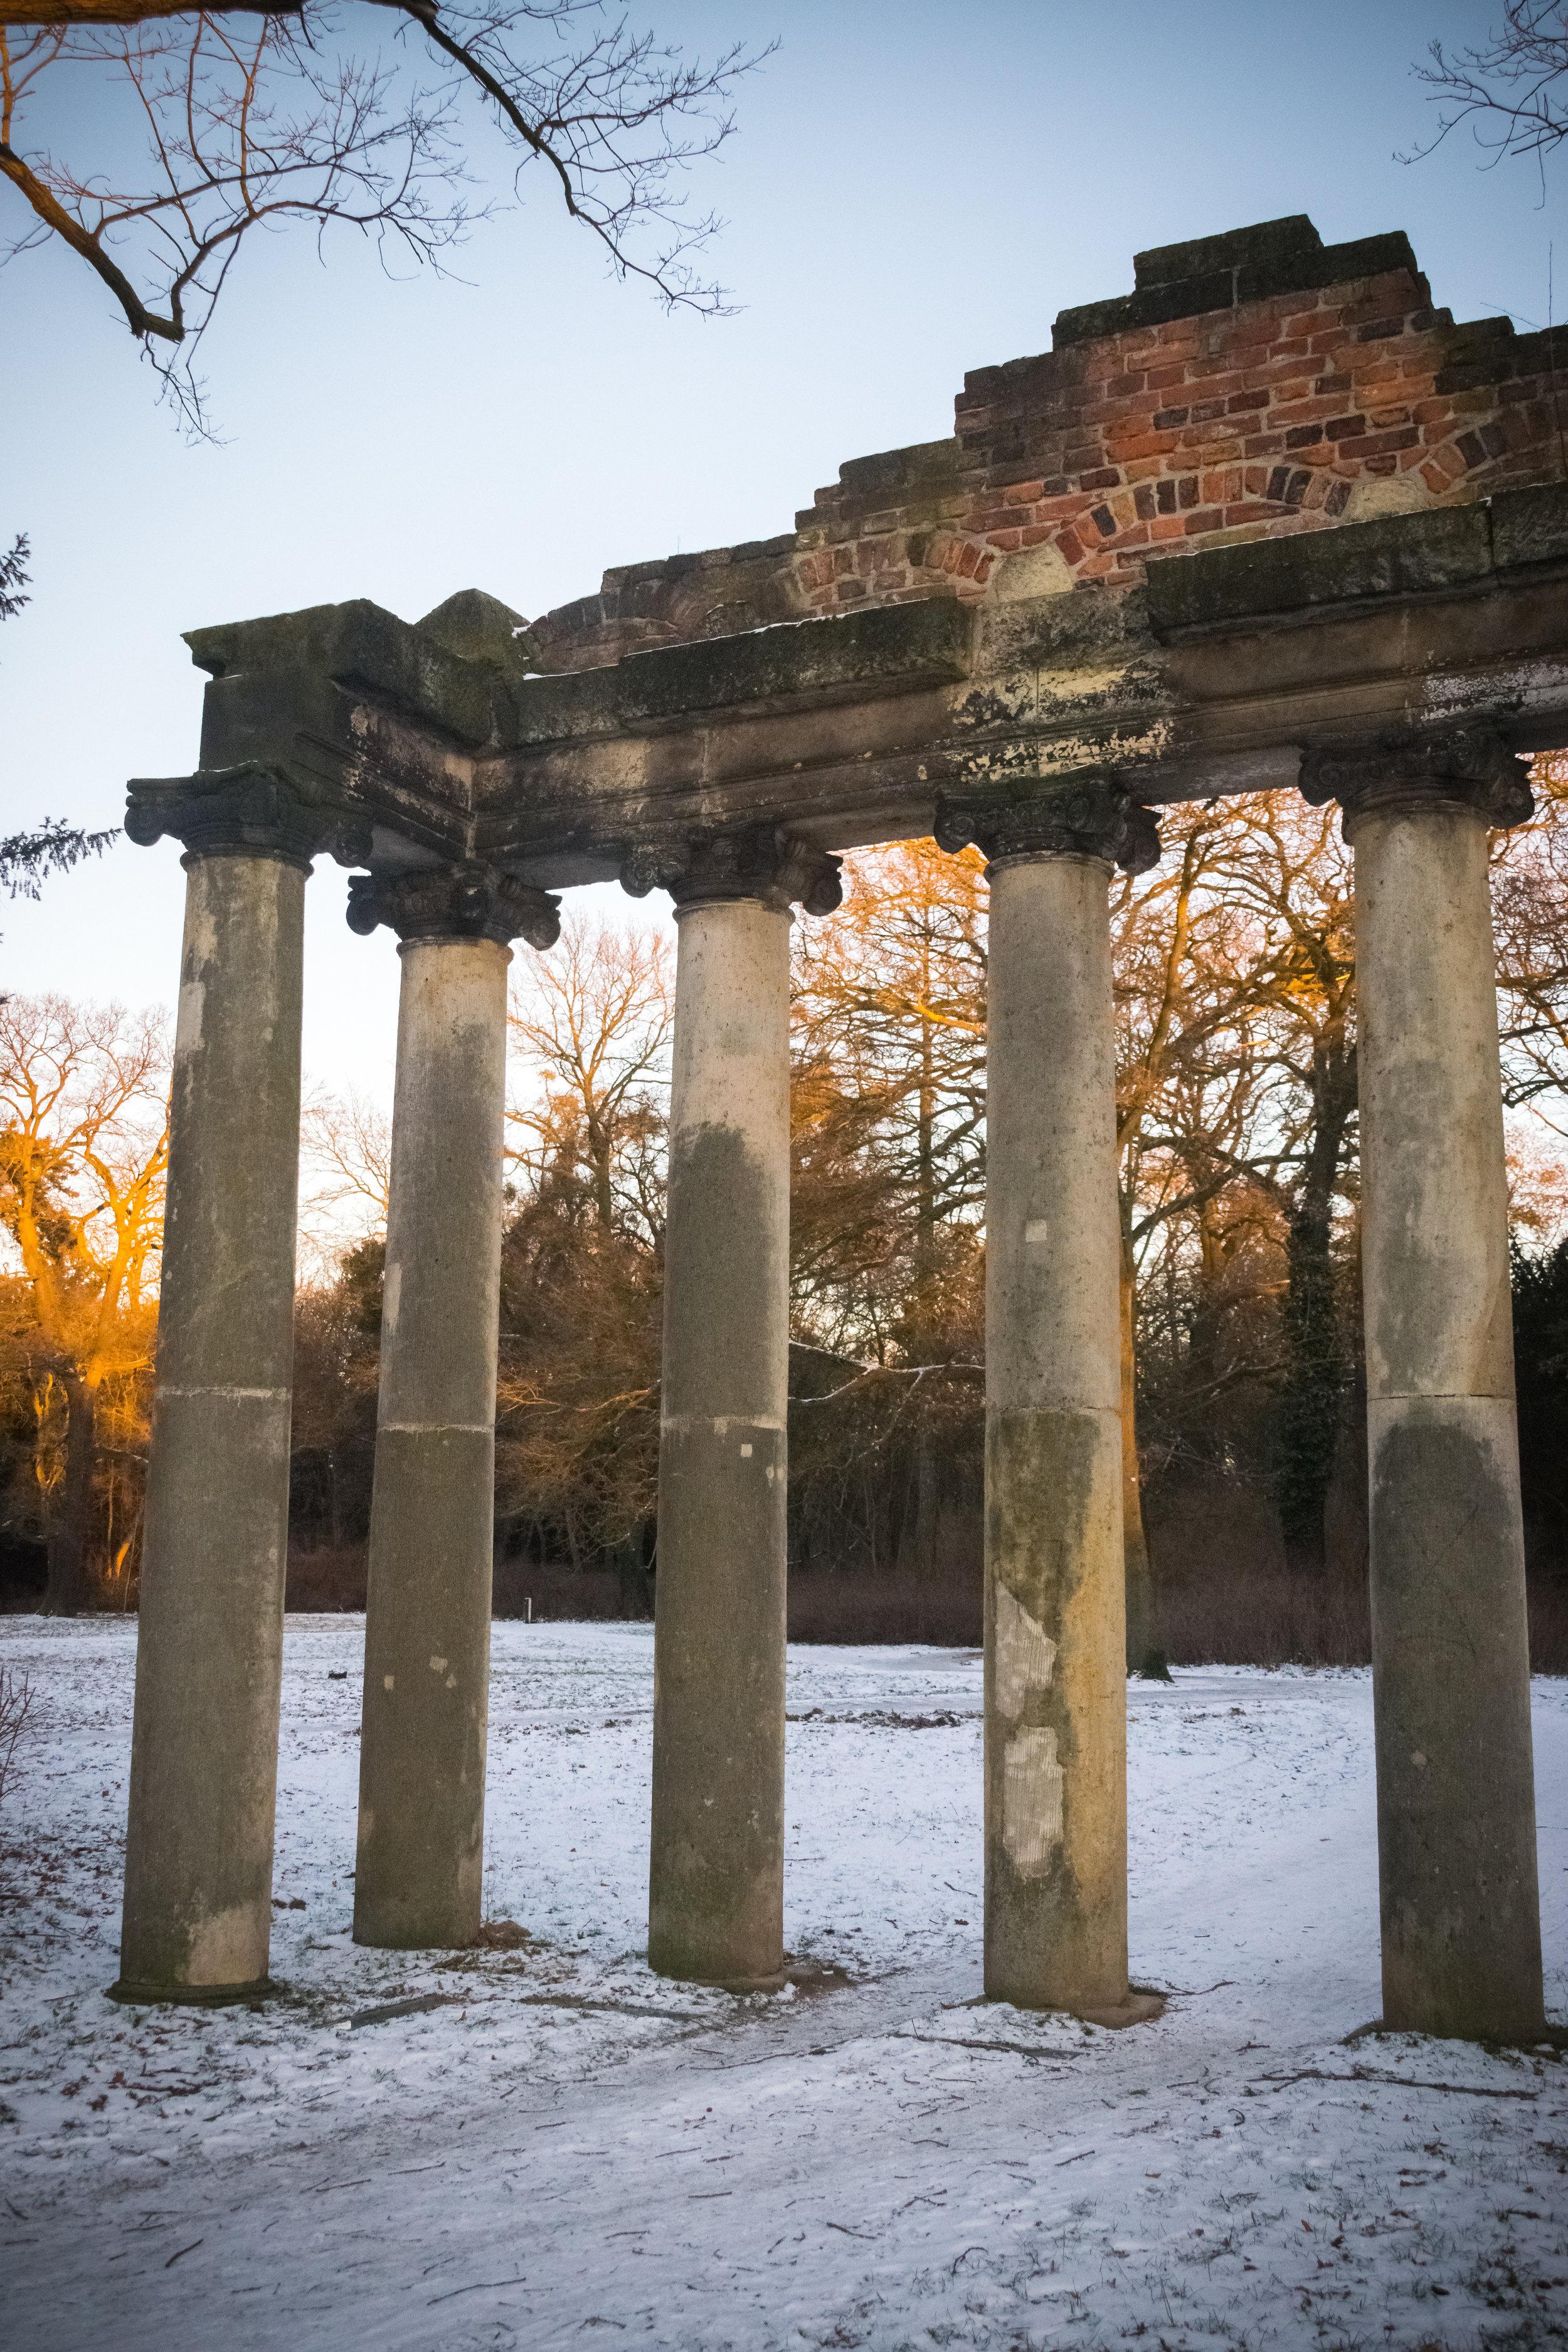 Sieben Saeulen Roman ruins across from refreshment kiosk